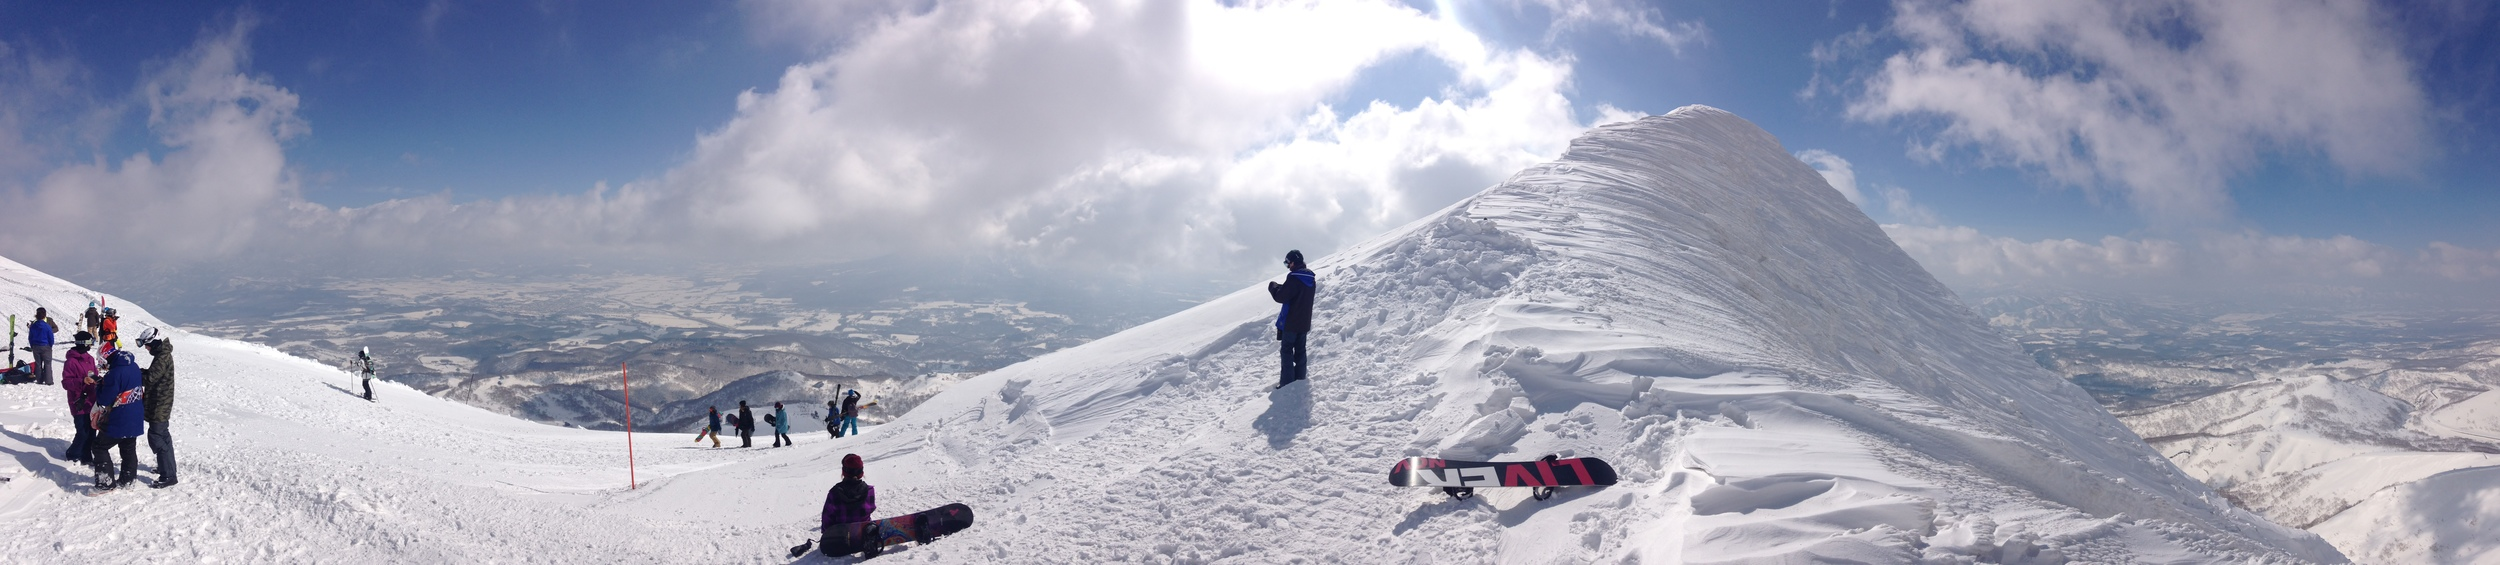 Summit Mt Niseko- An'nupuri